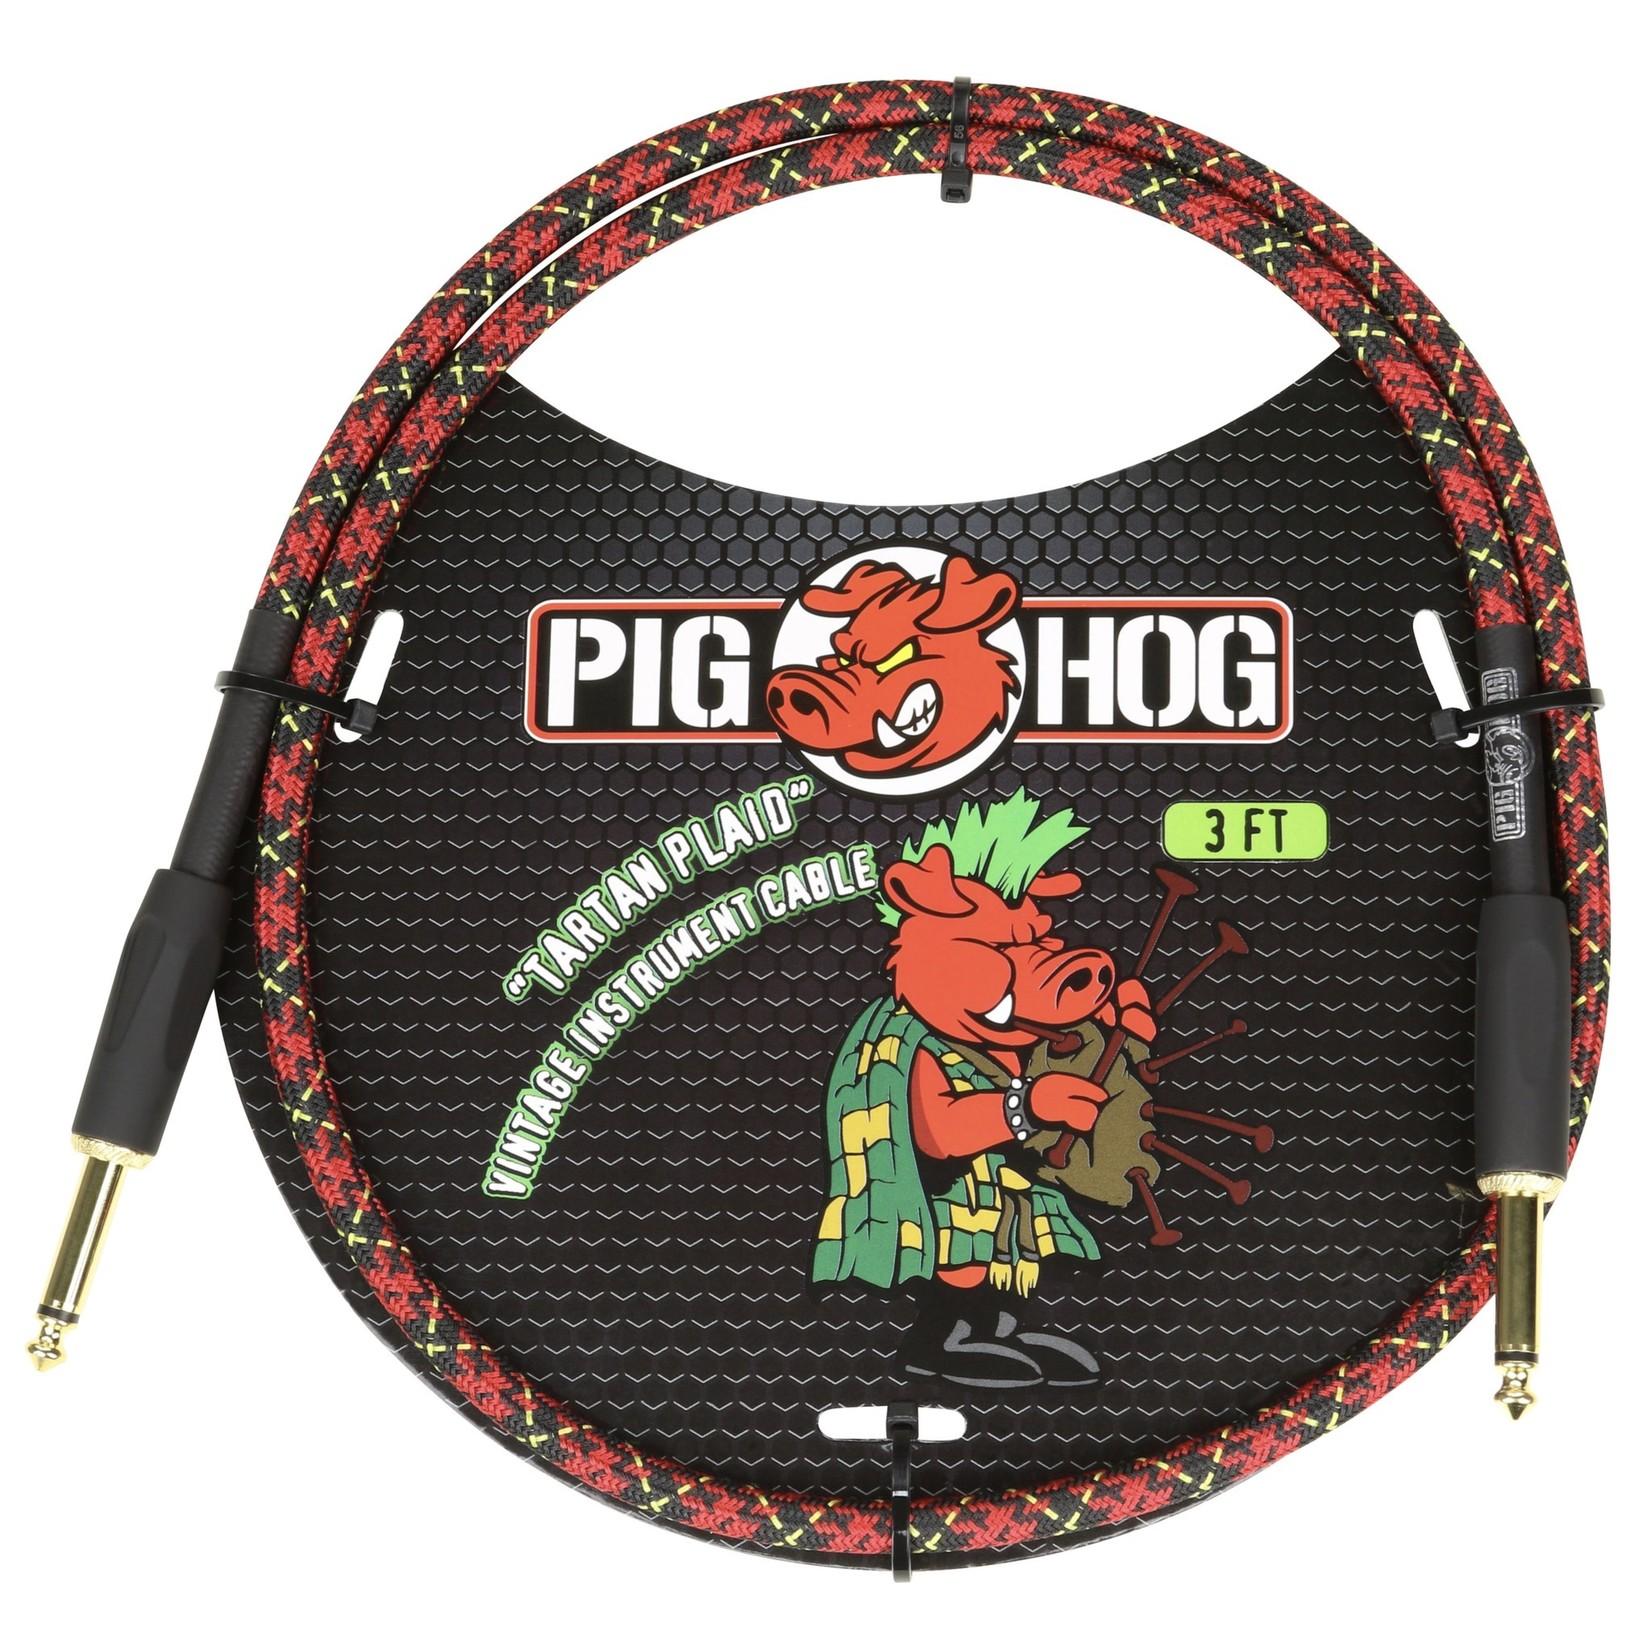 "Pig Hog Pig Hog Vintage Woven Patch Cable, 3-Foot, 7mm, 1/4"" Straight Connectors, ""Tartan Plaid"" (PCH3PL)"